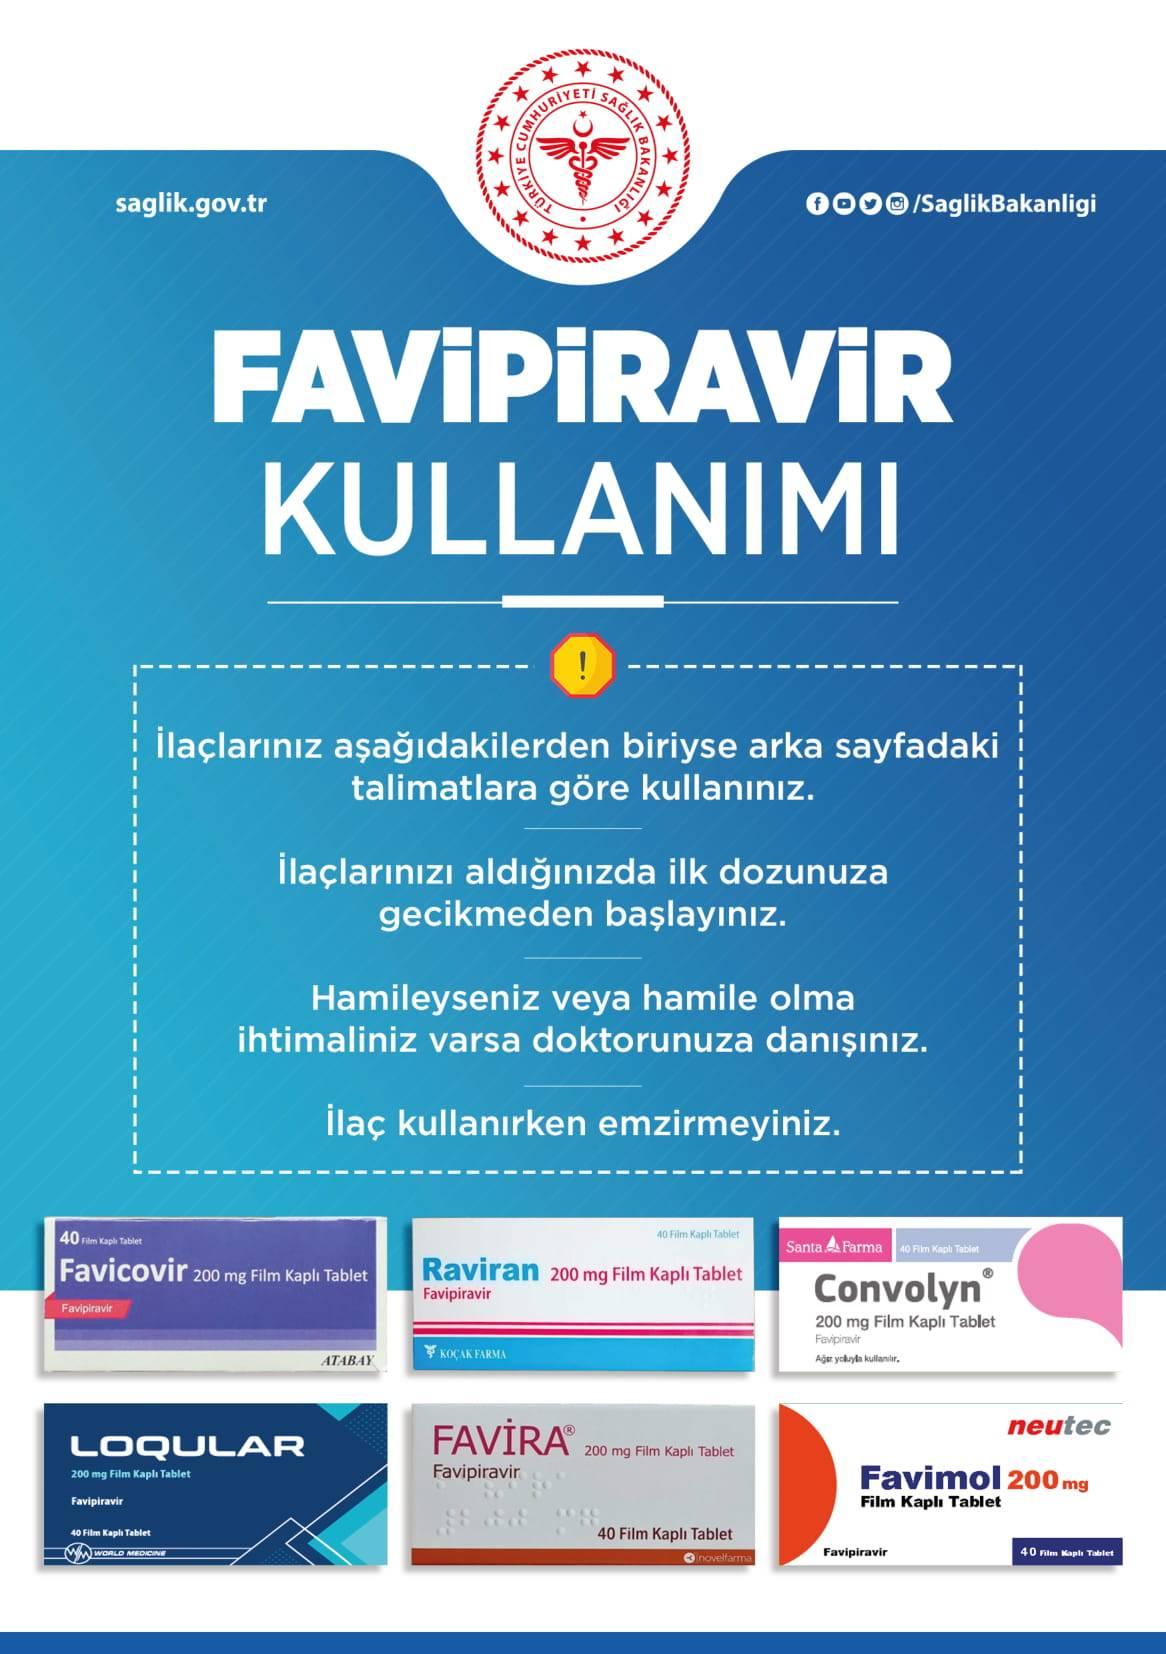 Favipiravir, Favicovir, Favira, Favimol, Raviran, Convolyn, Loqular nasıl kullanılır.